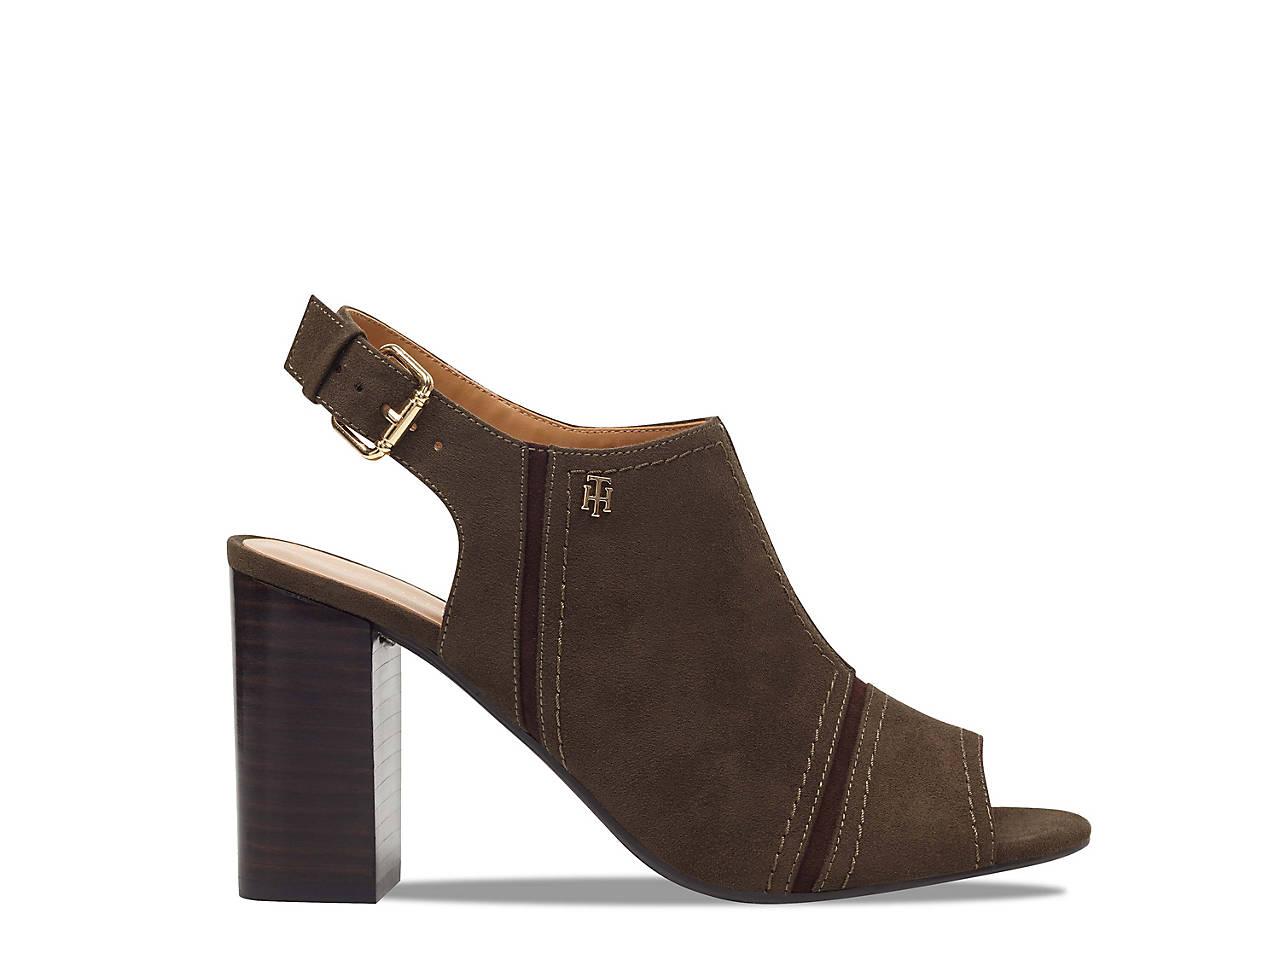 fa89fa6ddbf Tommy Hilfiger Relita 2 Sandal Women s Shoes